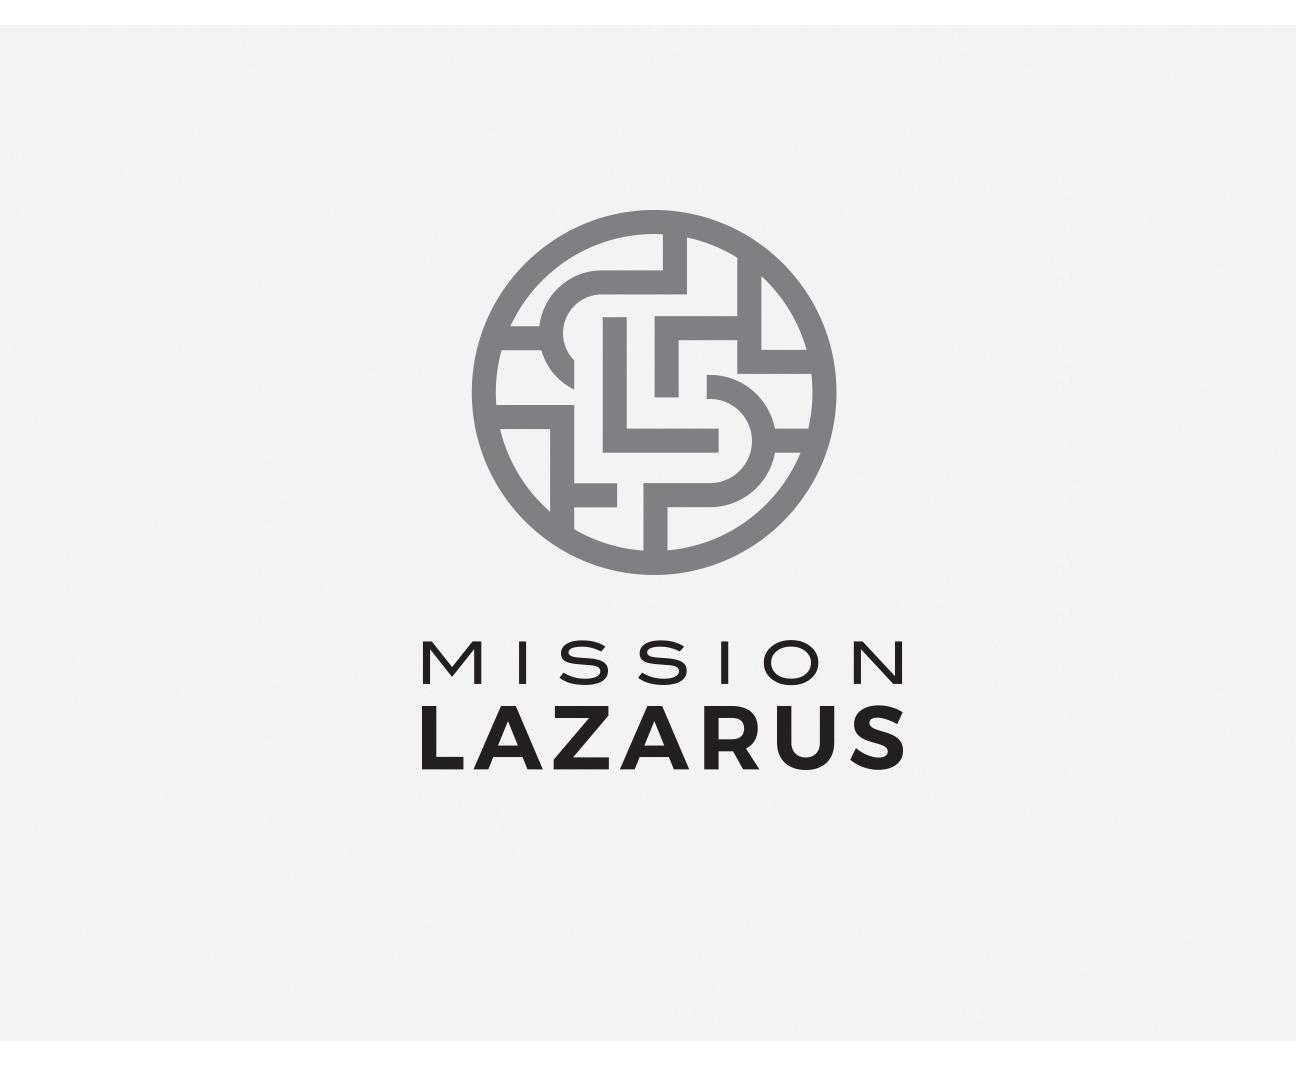 logo_missionlazarus_gs.jpg